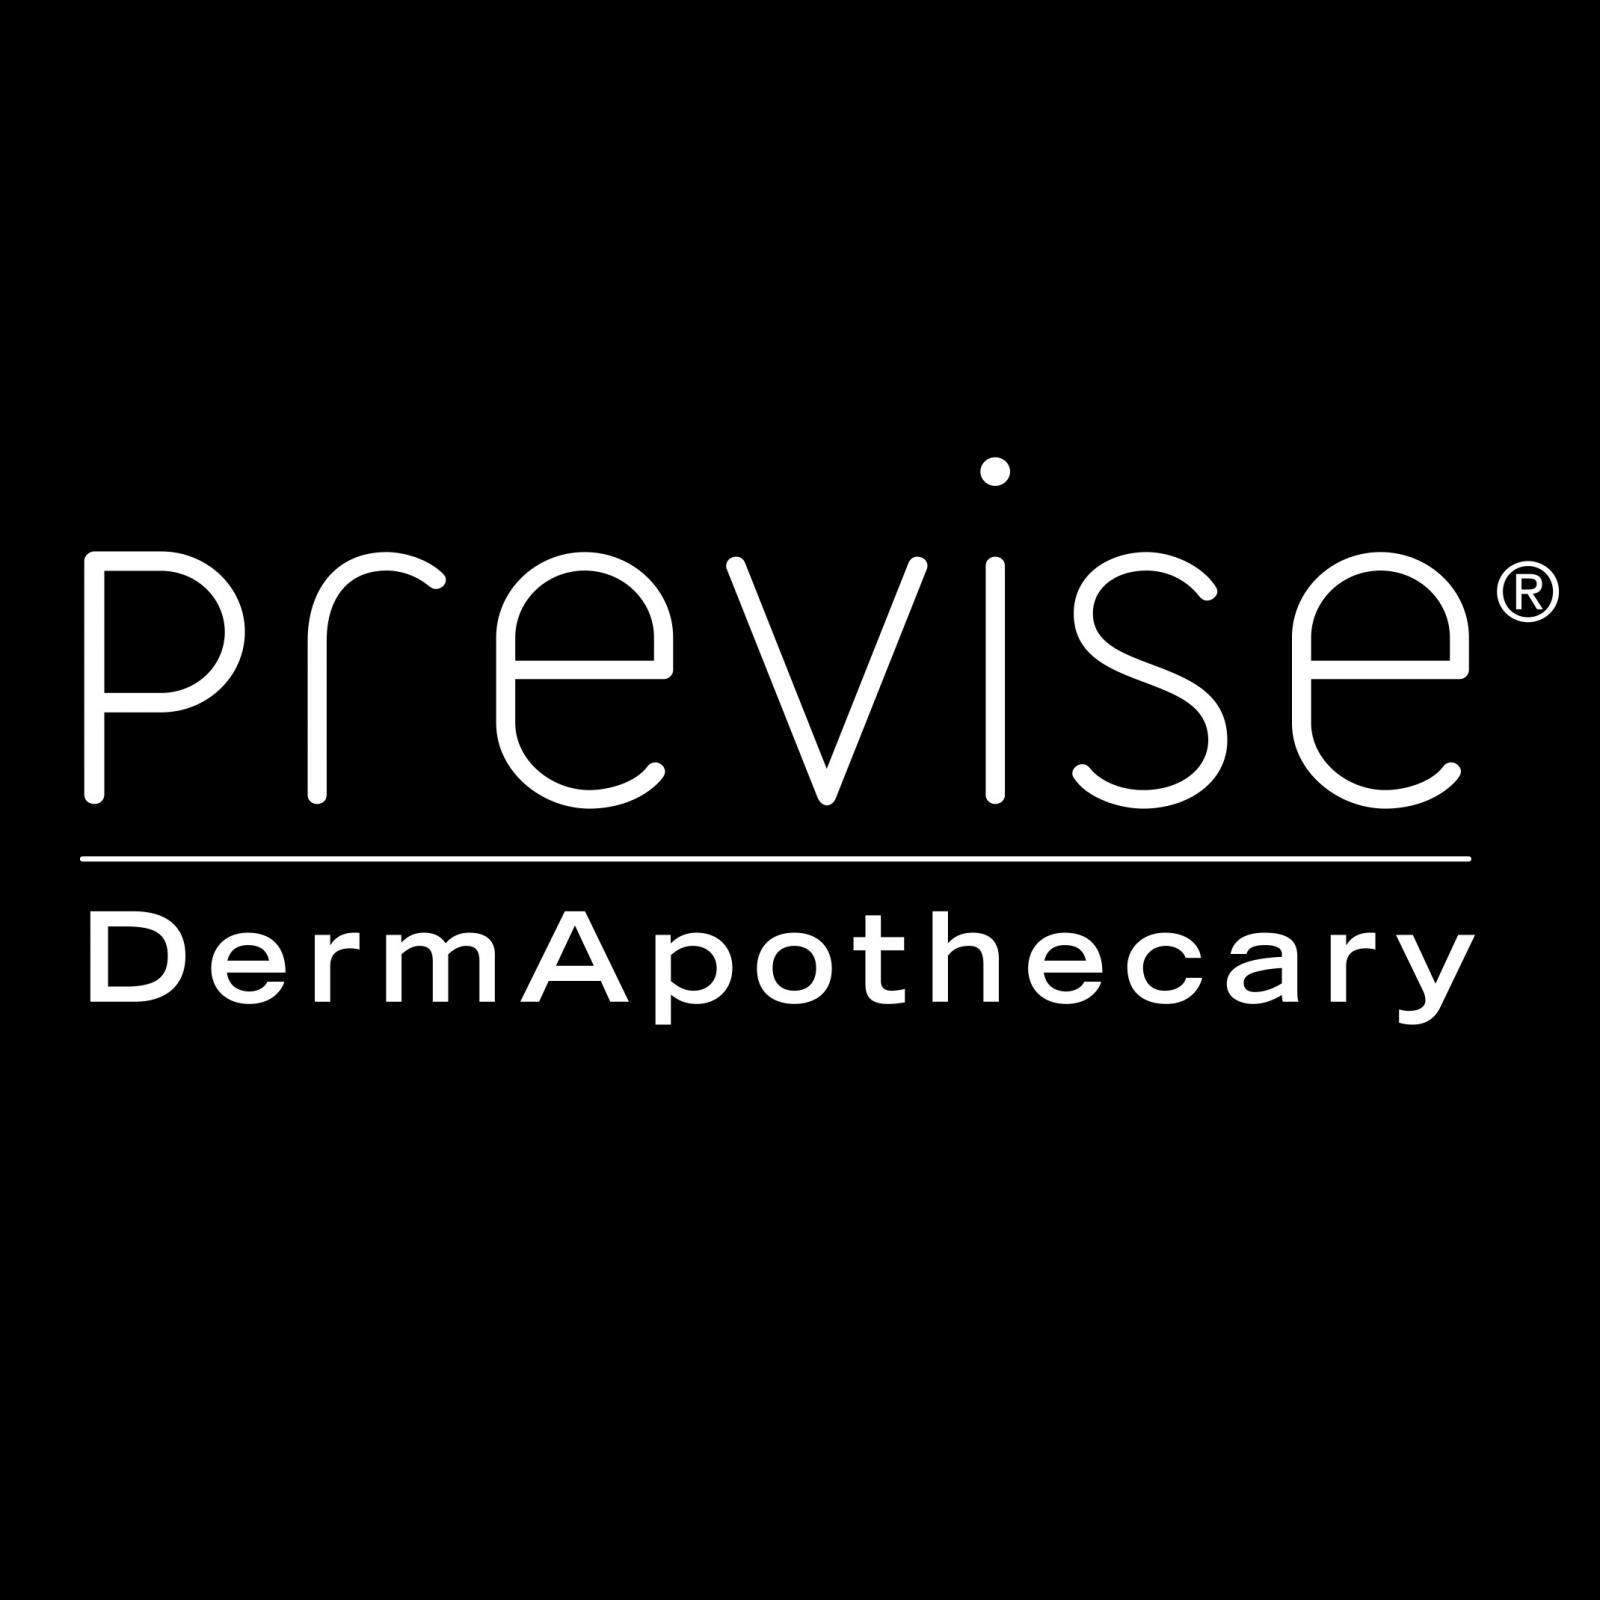 Previse SkinCare's logo